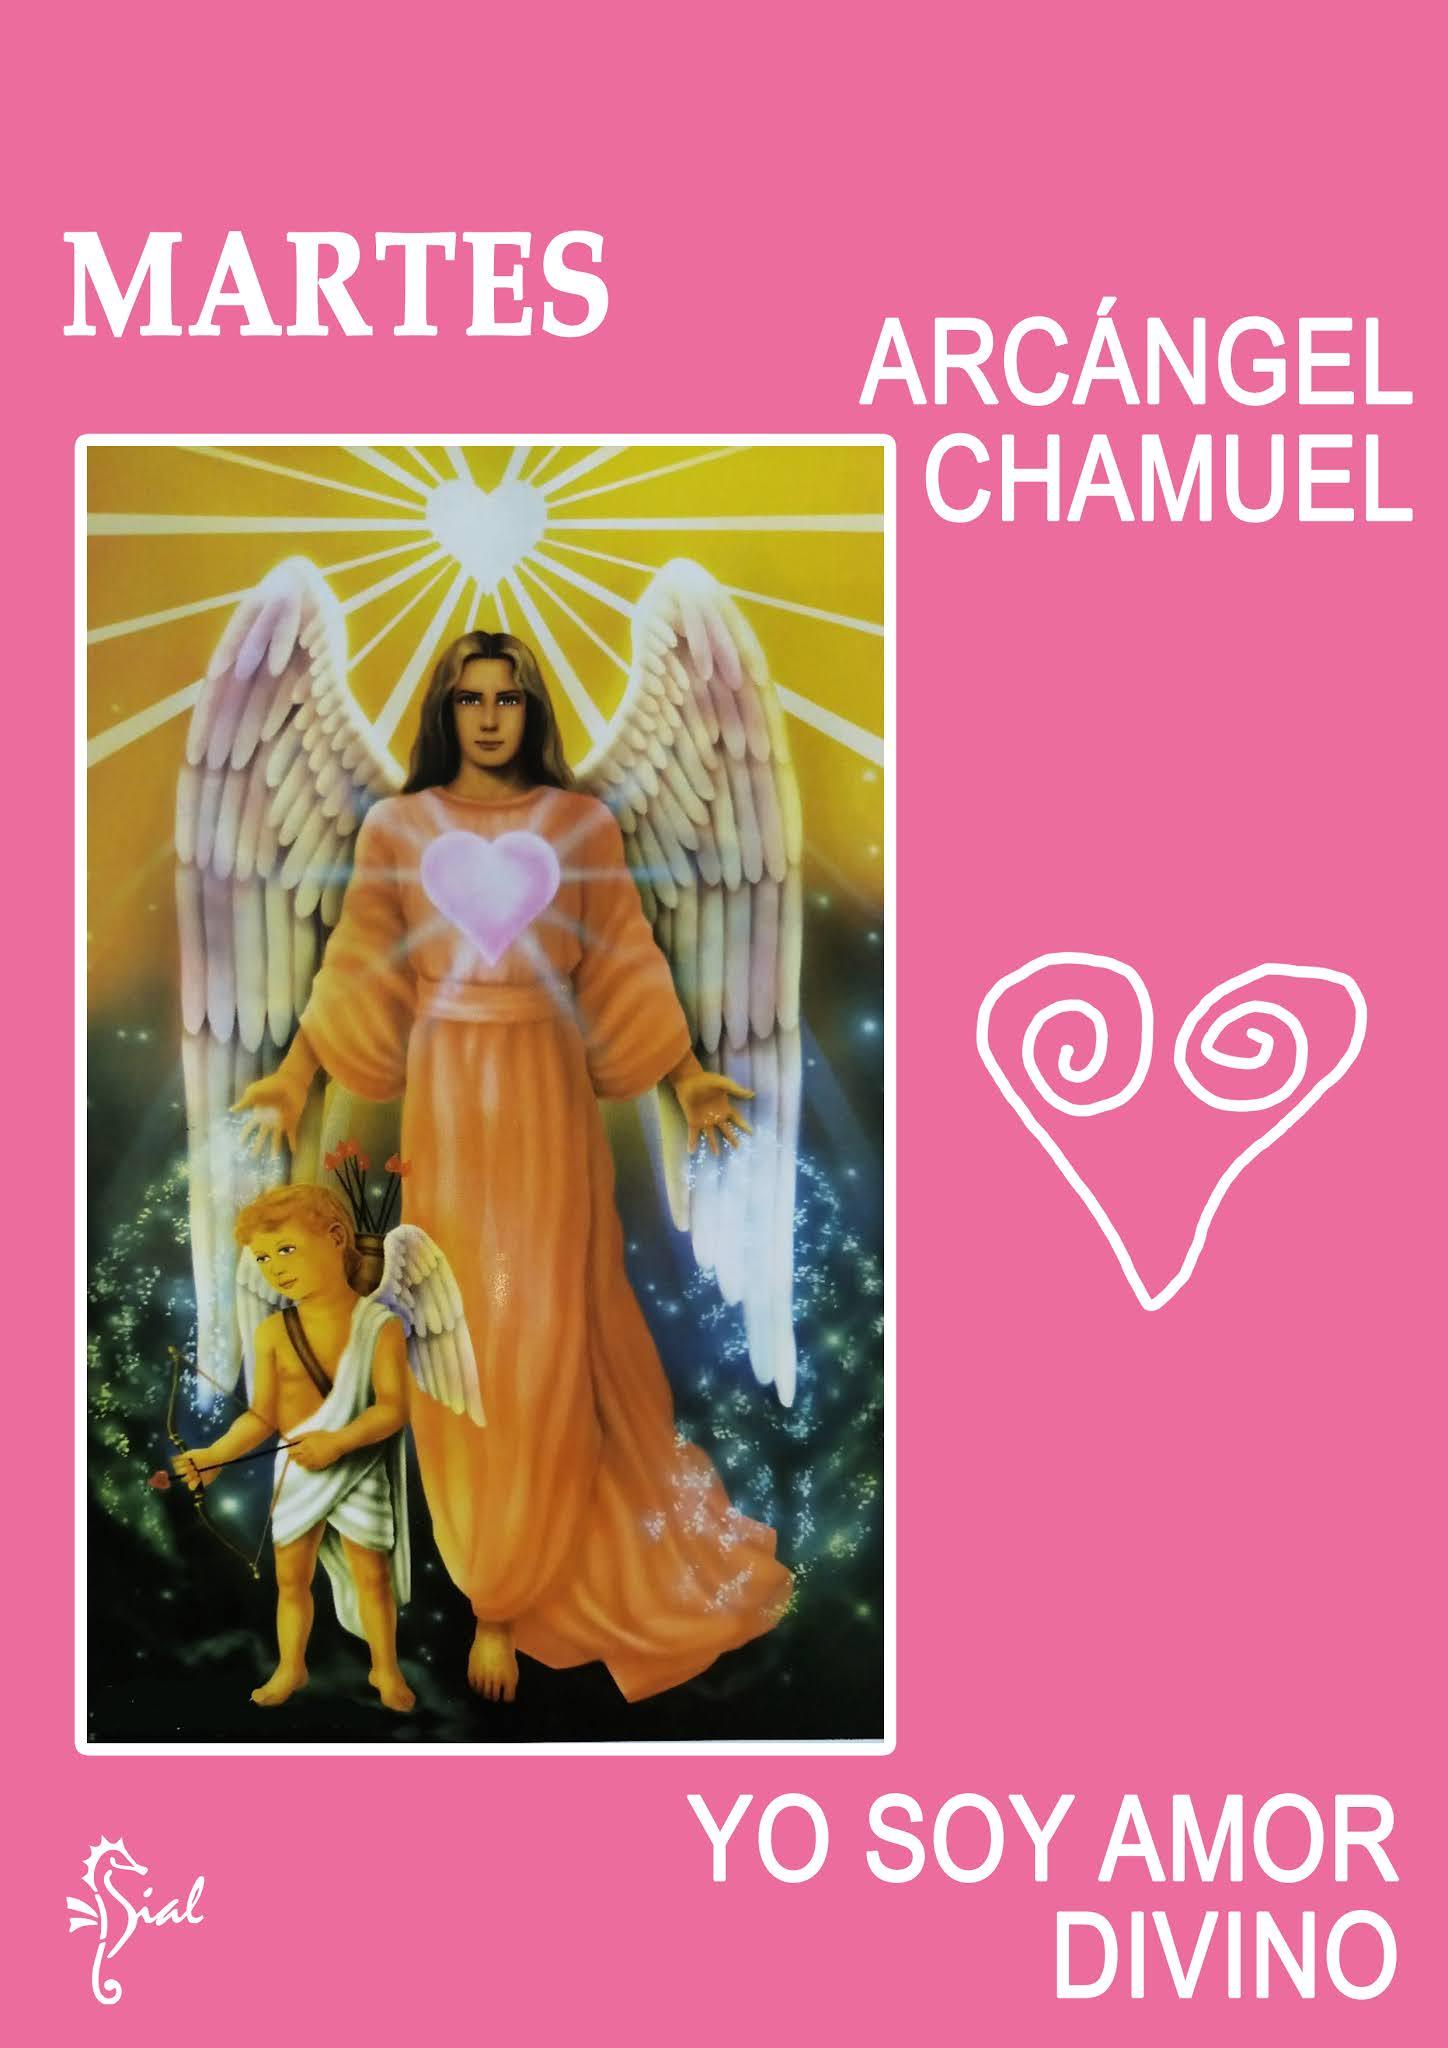 Arcángel Chamuel - ángeles del amor